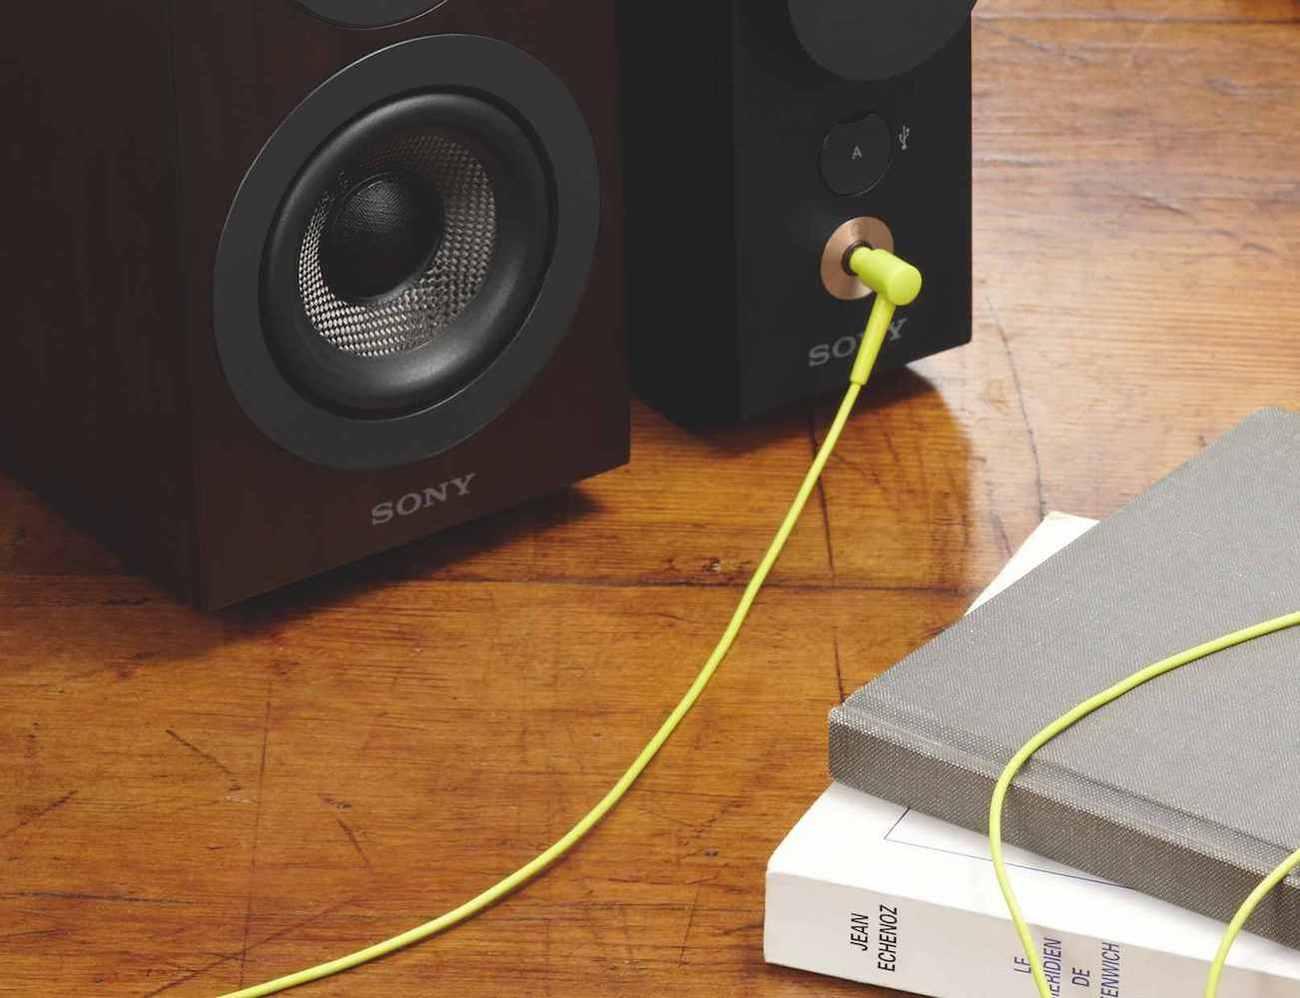 Sony High-Resolution Audio System